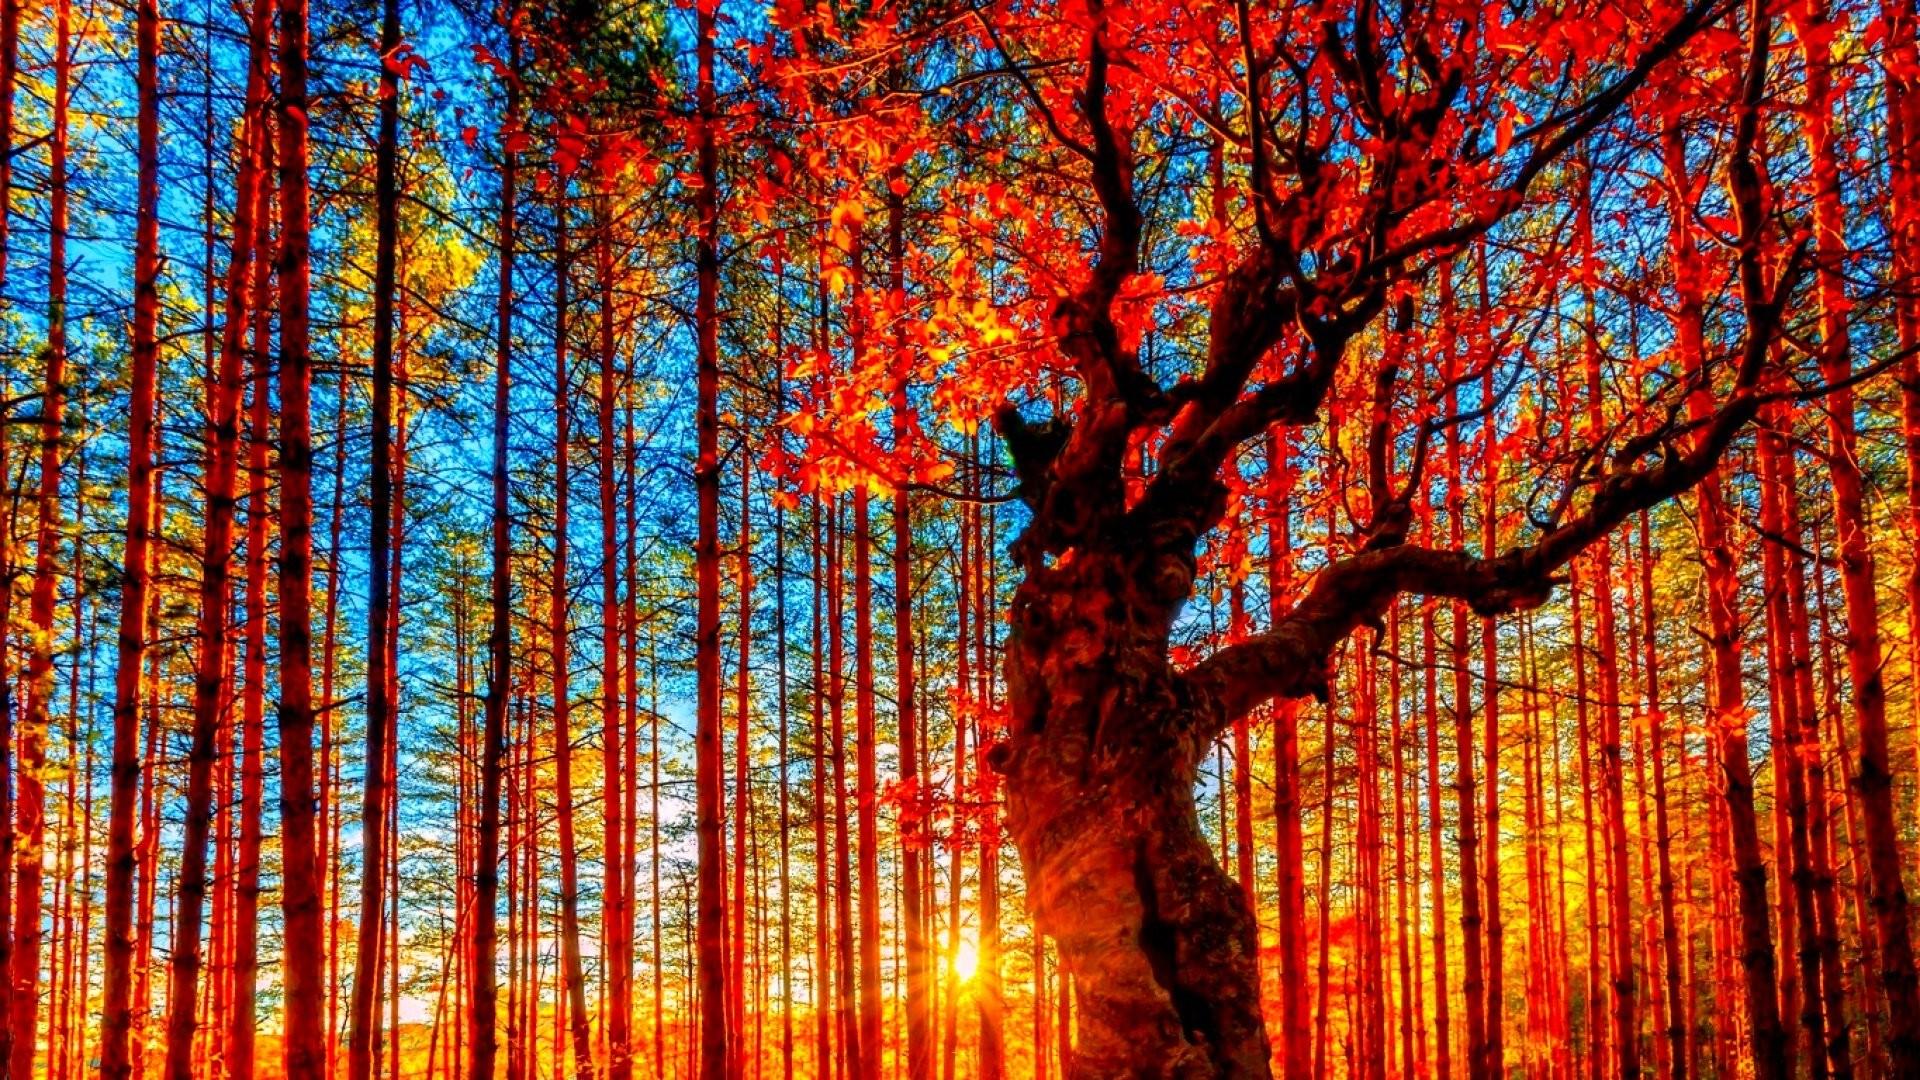 Autumn season fall color tree forest nature landscape .